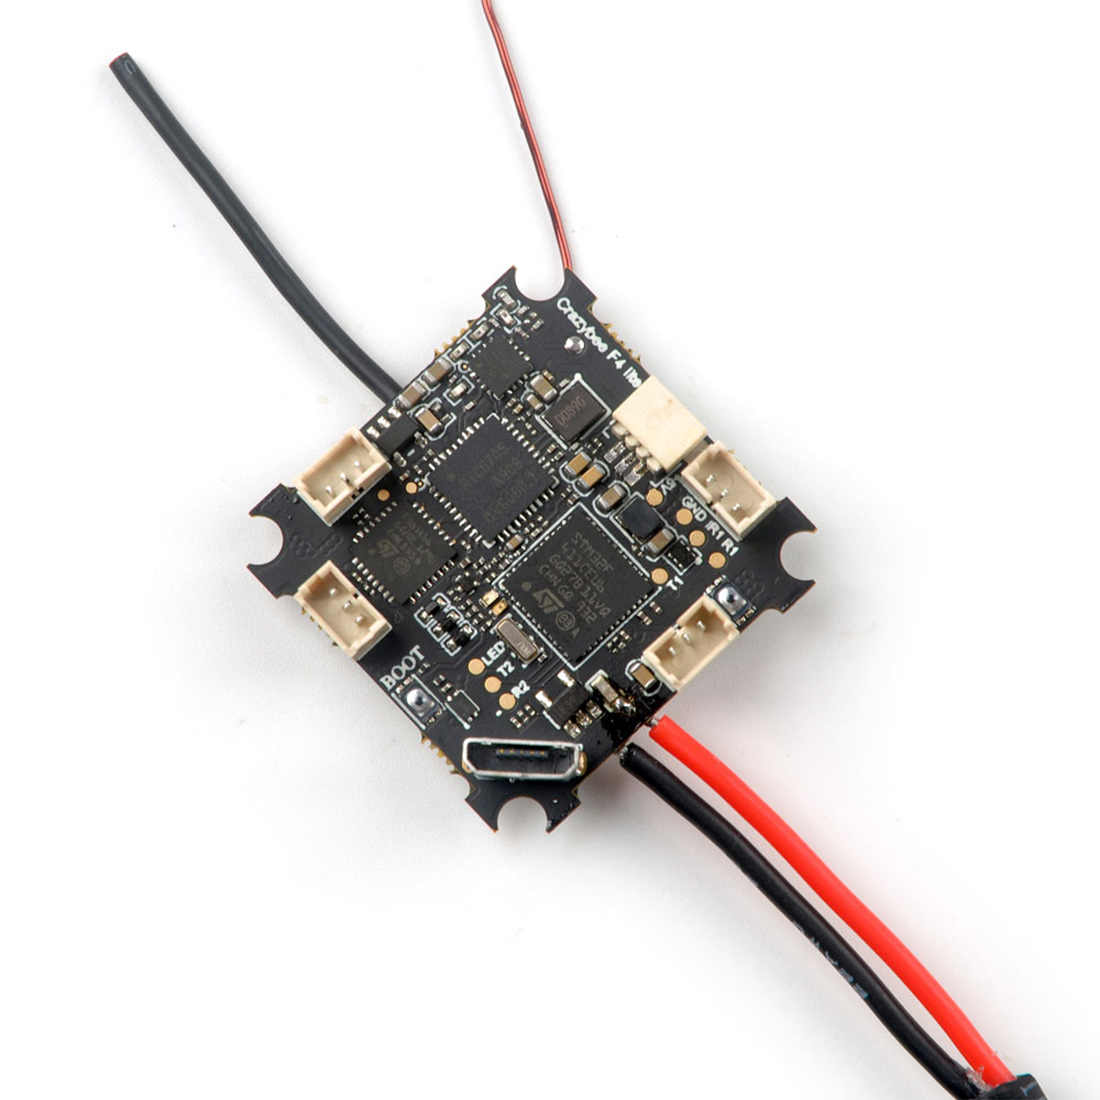 Happymodel Crazybee F4 Lite 1S Flight Controller Built-in 5.8G VTX FC//ESC//RX//VTX